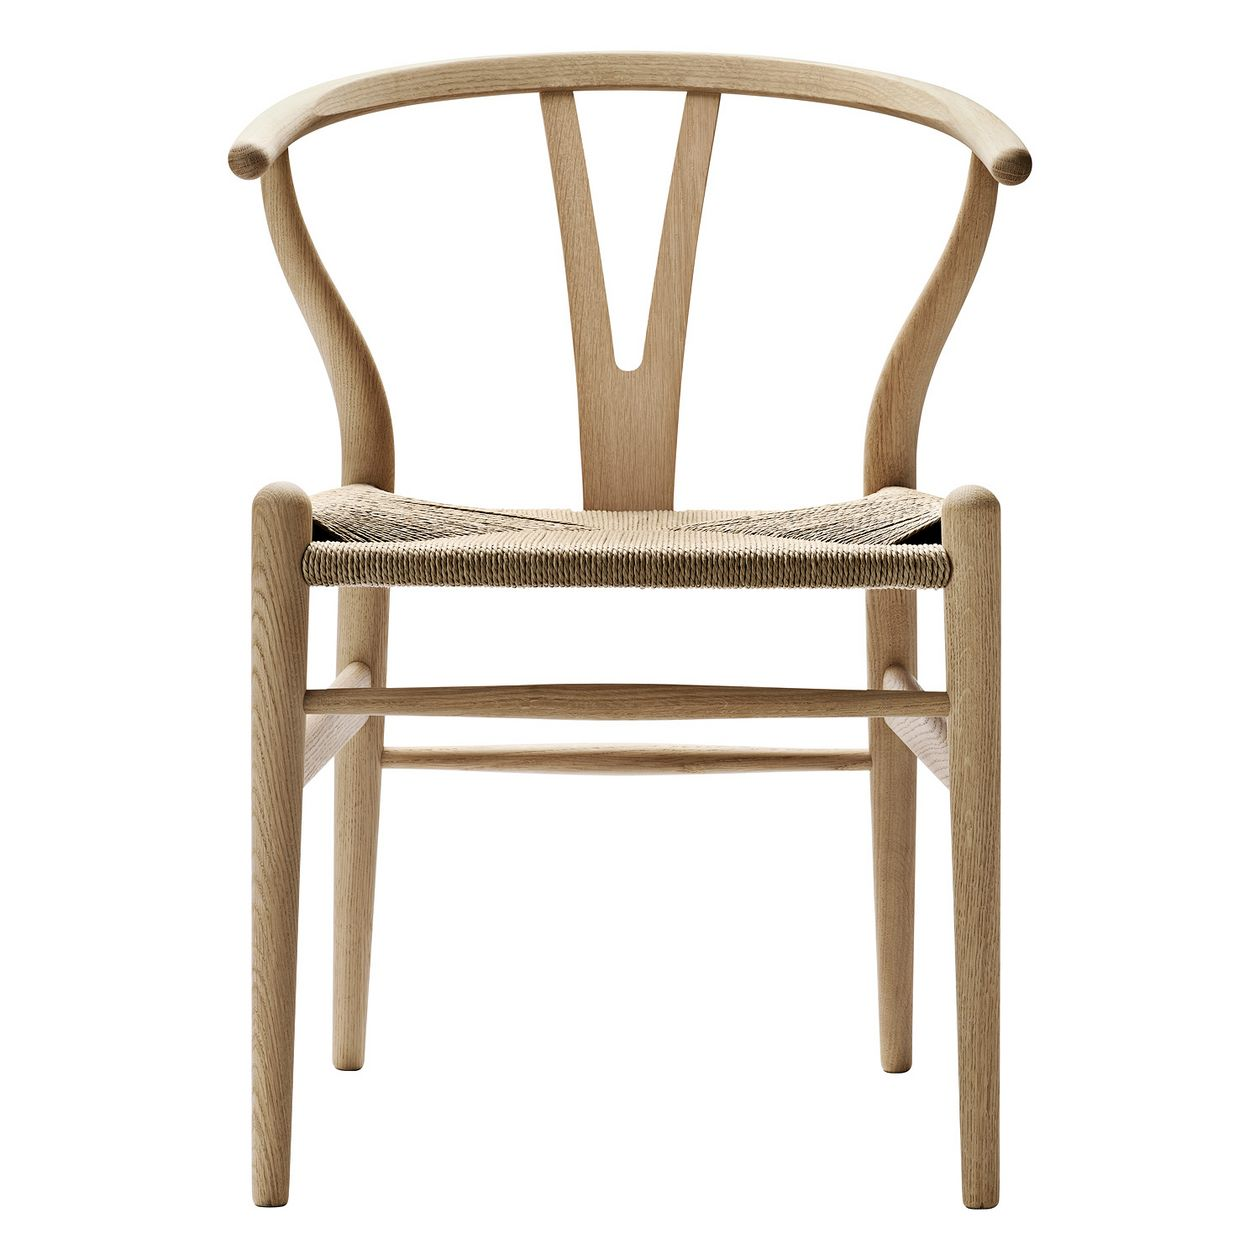 Carl Hansen & Søn CH24 Wishbone chair, soaped oak - natural cord